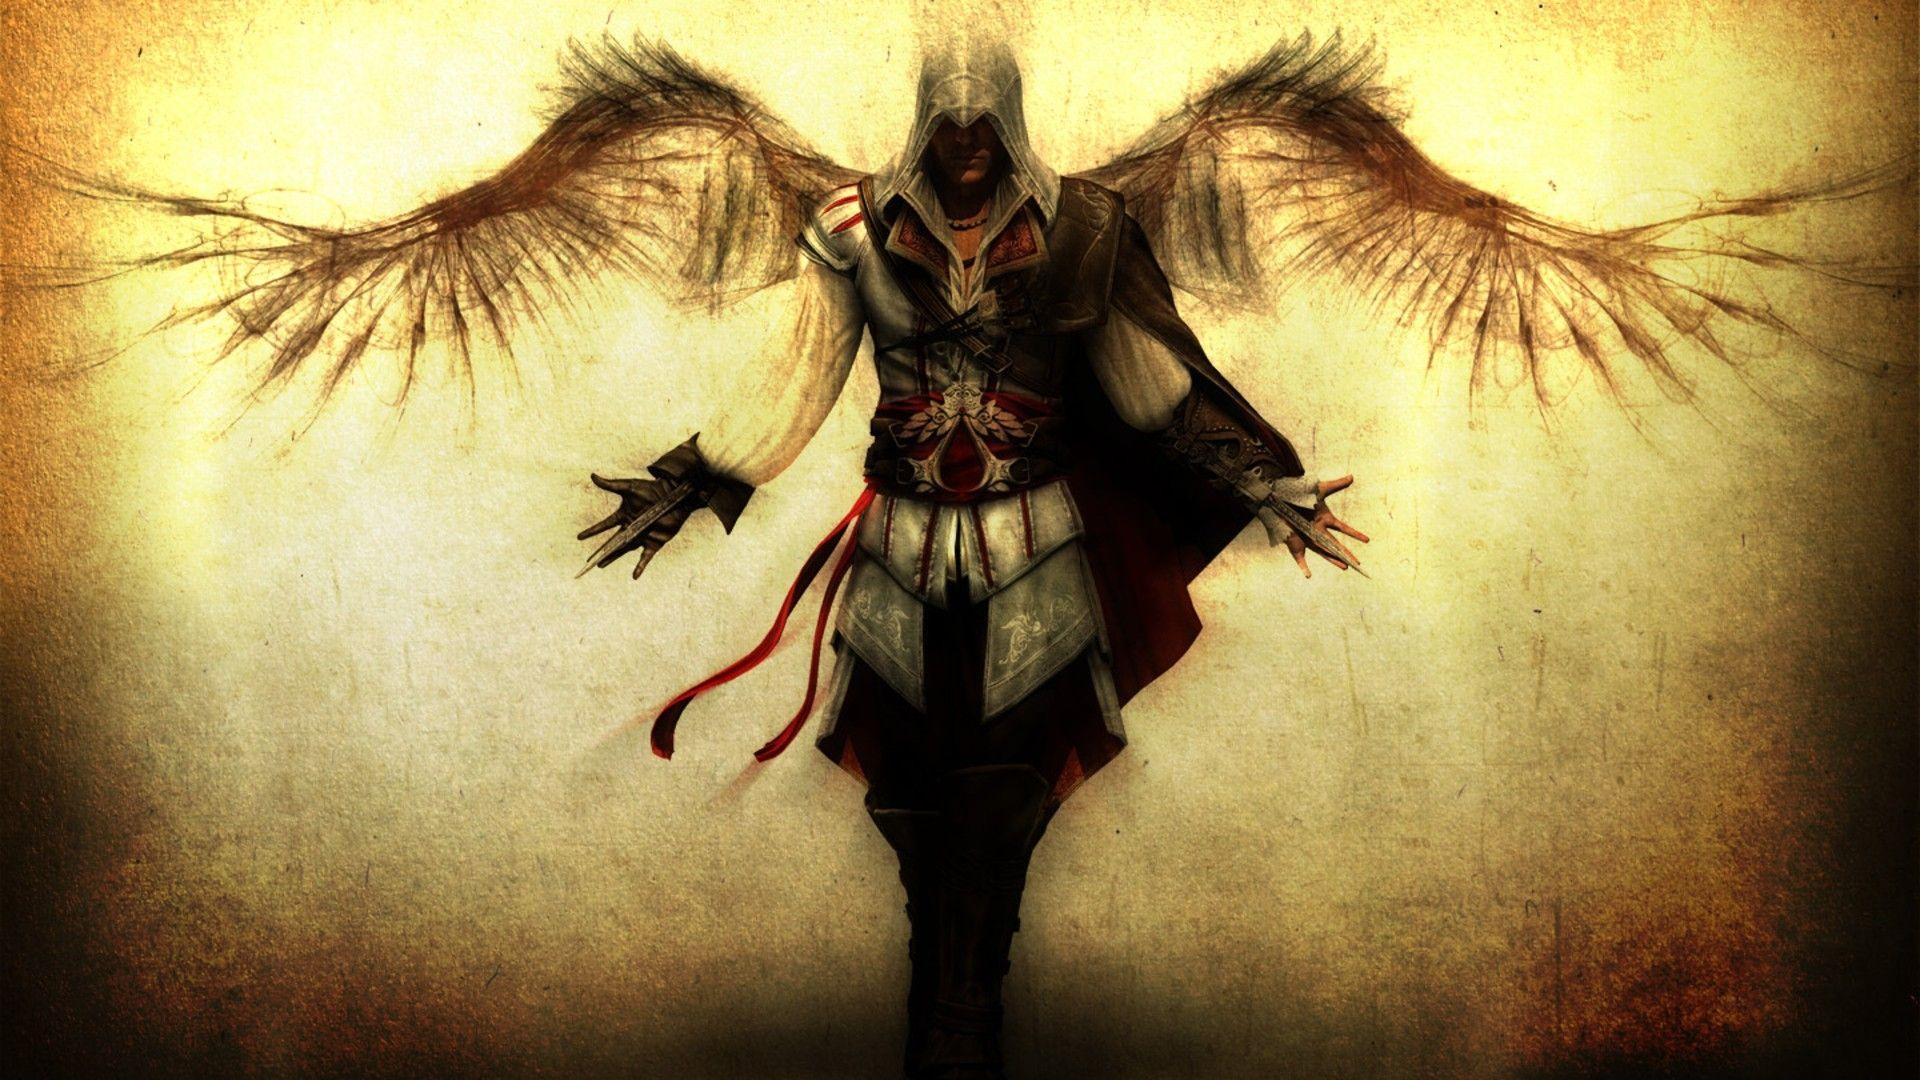 Full Hd P Assassins Creed Wallpapers Hd Desktop Backgrounds